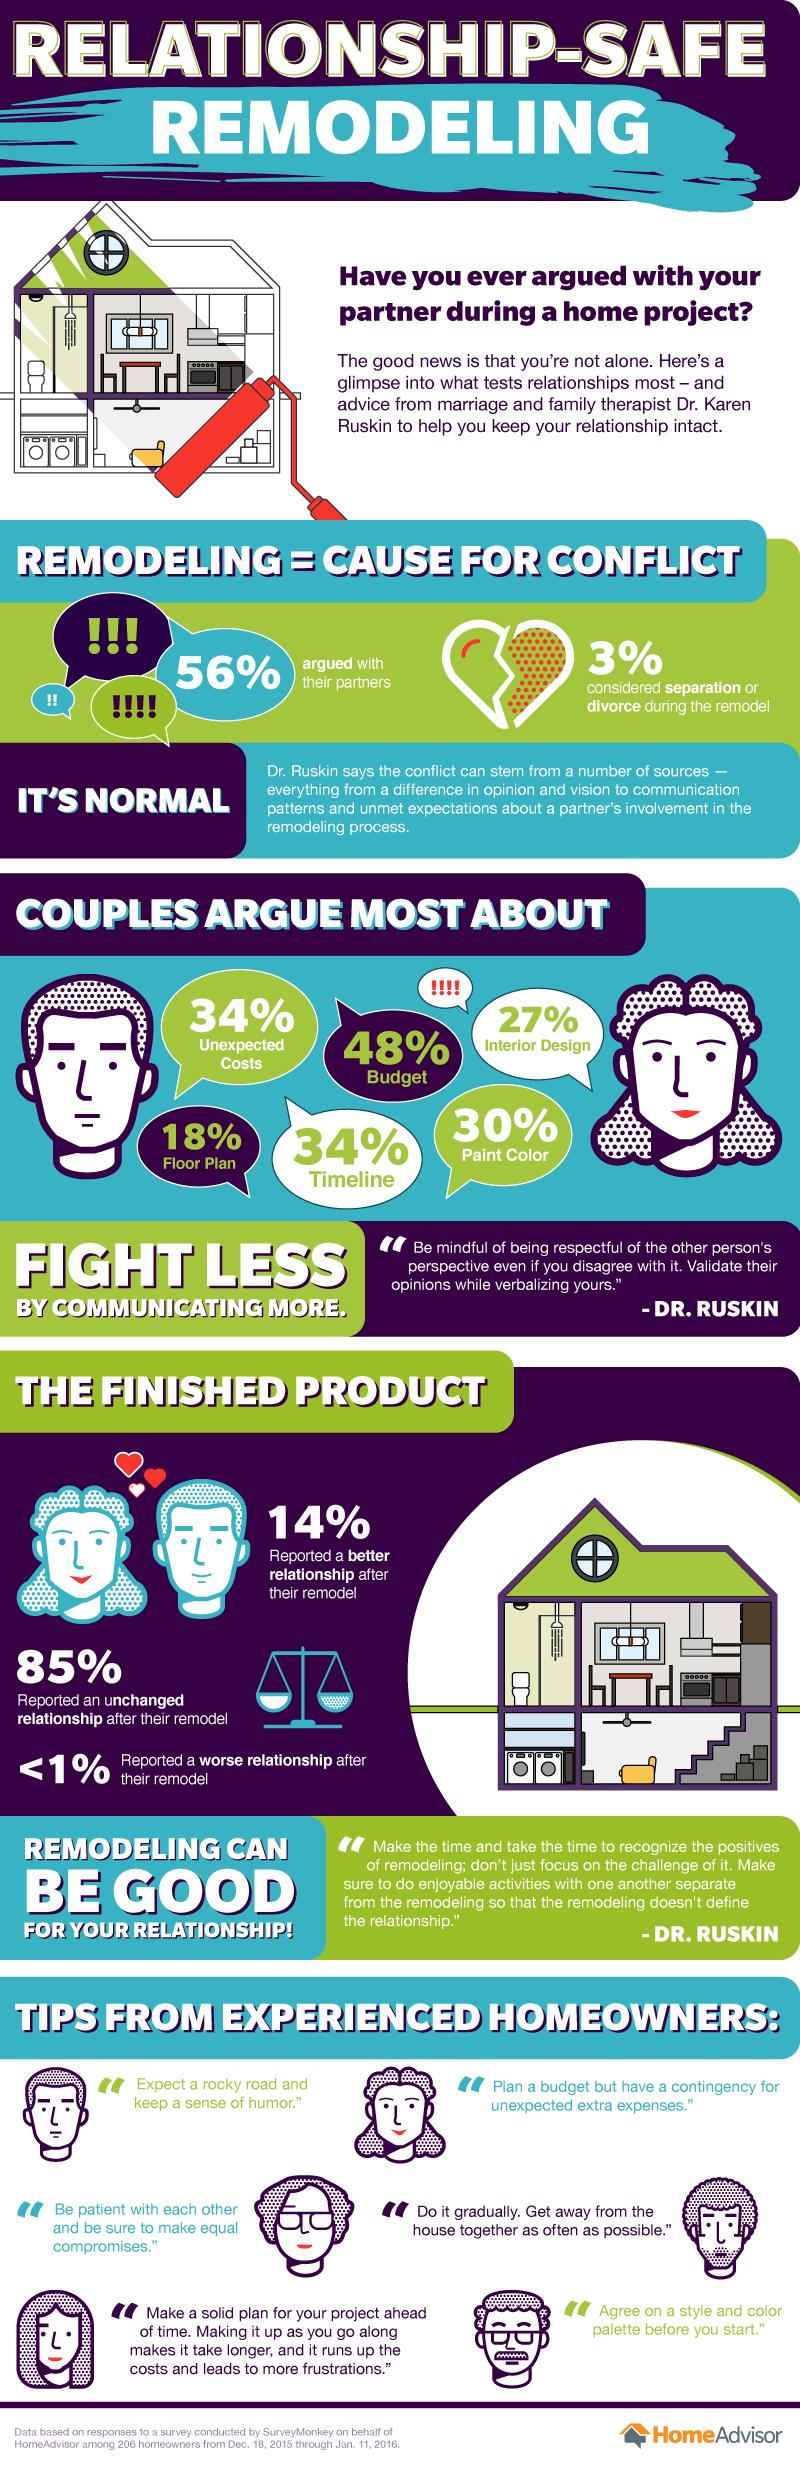 Relationship Safe Remodeling Infographic